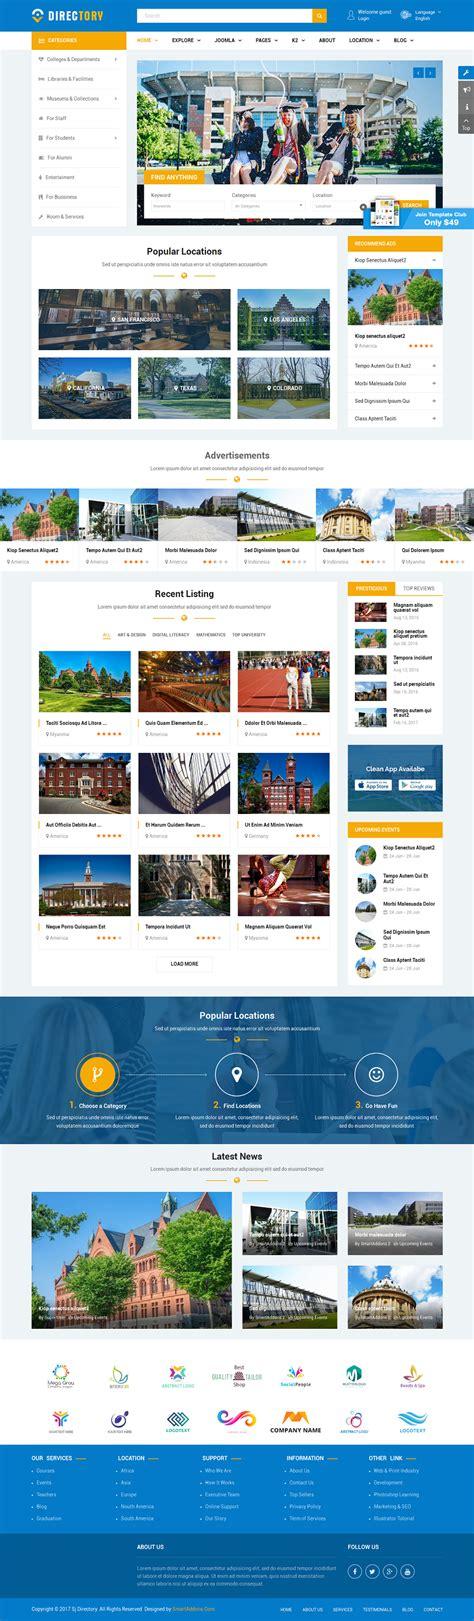 joomla category blog layout exle directory responsive ultimate directory joomla template